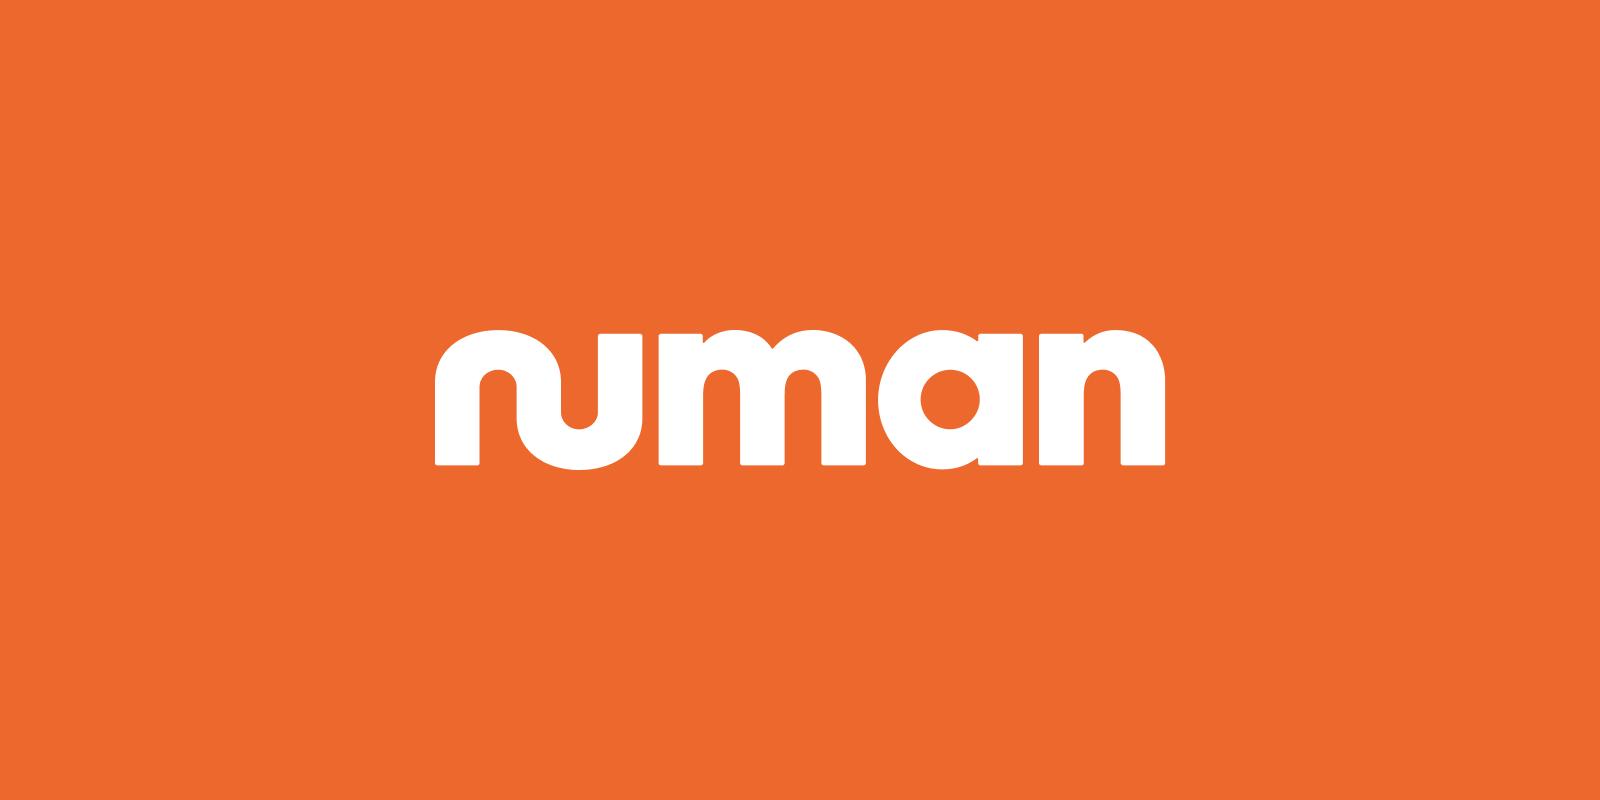 Numan Referral Code